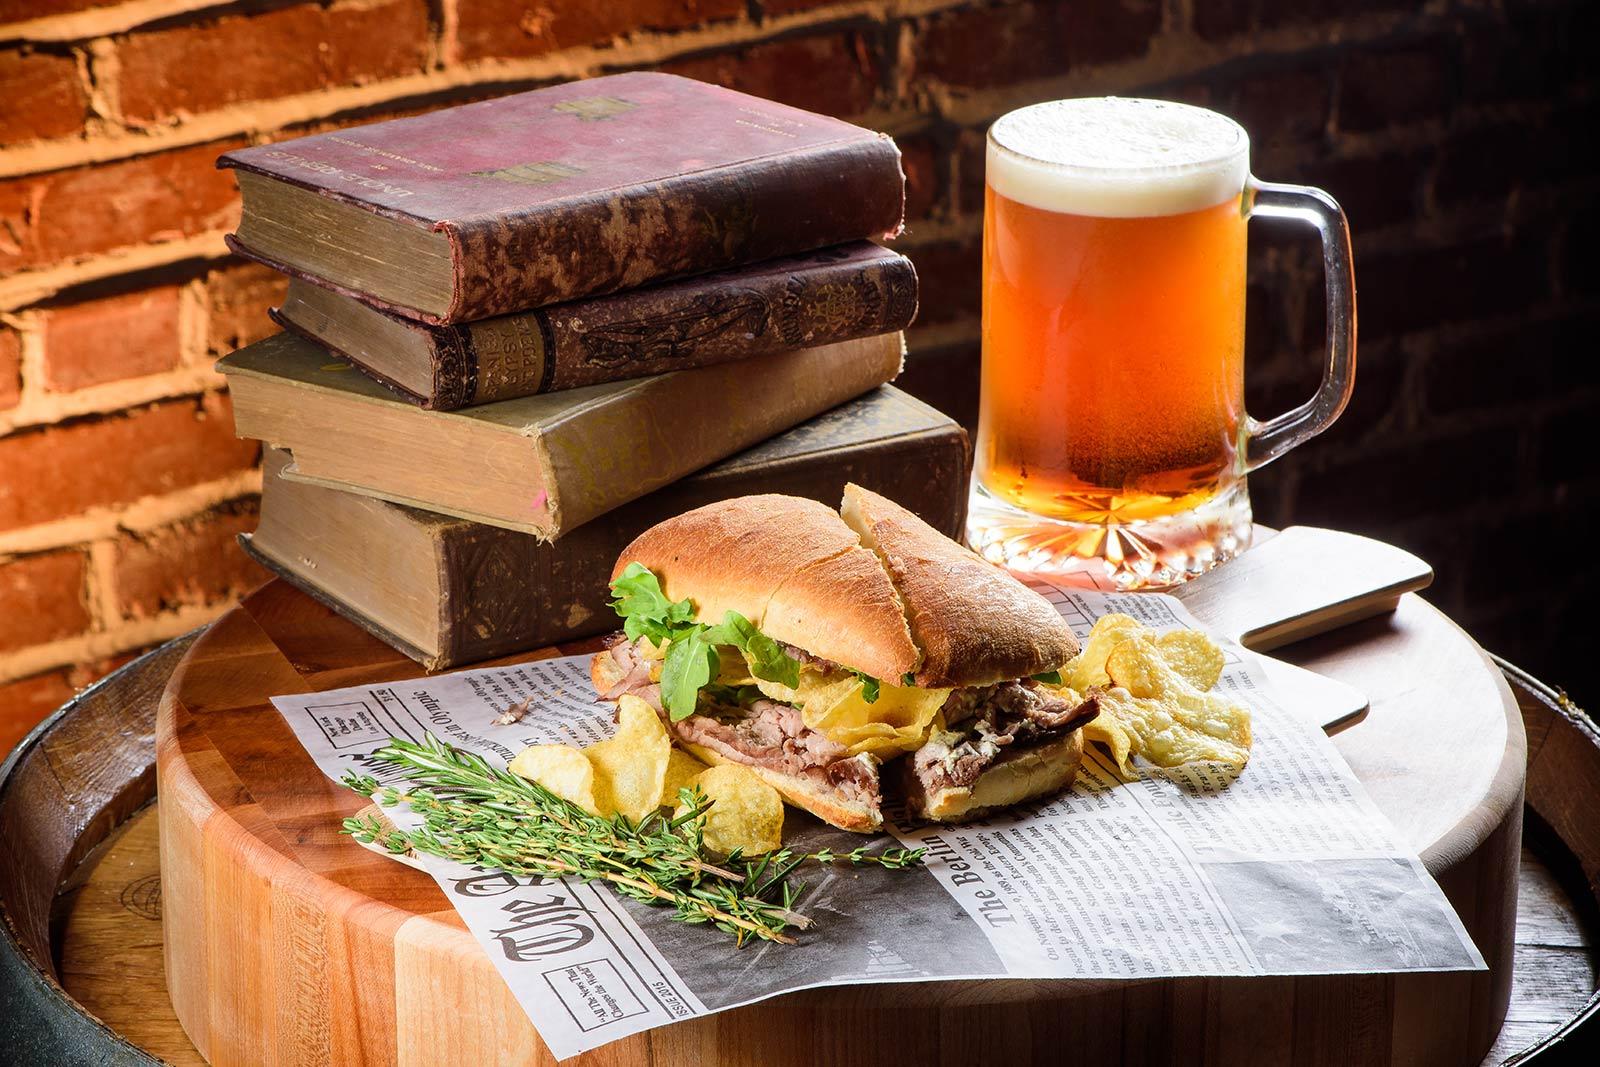 st-augustine-pub-food-english-pub-restaurant-chatsworth-chip-wreck